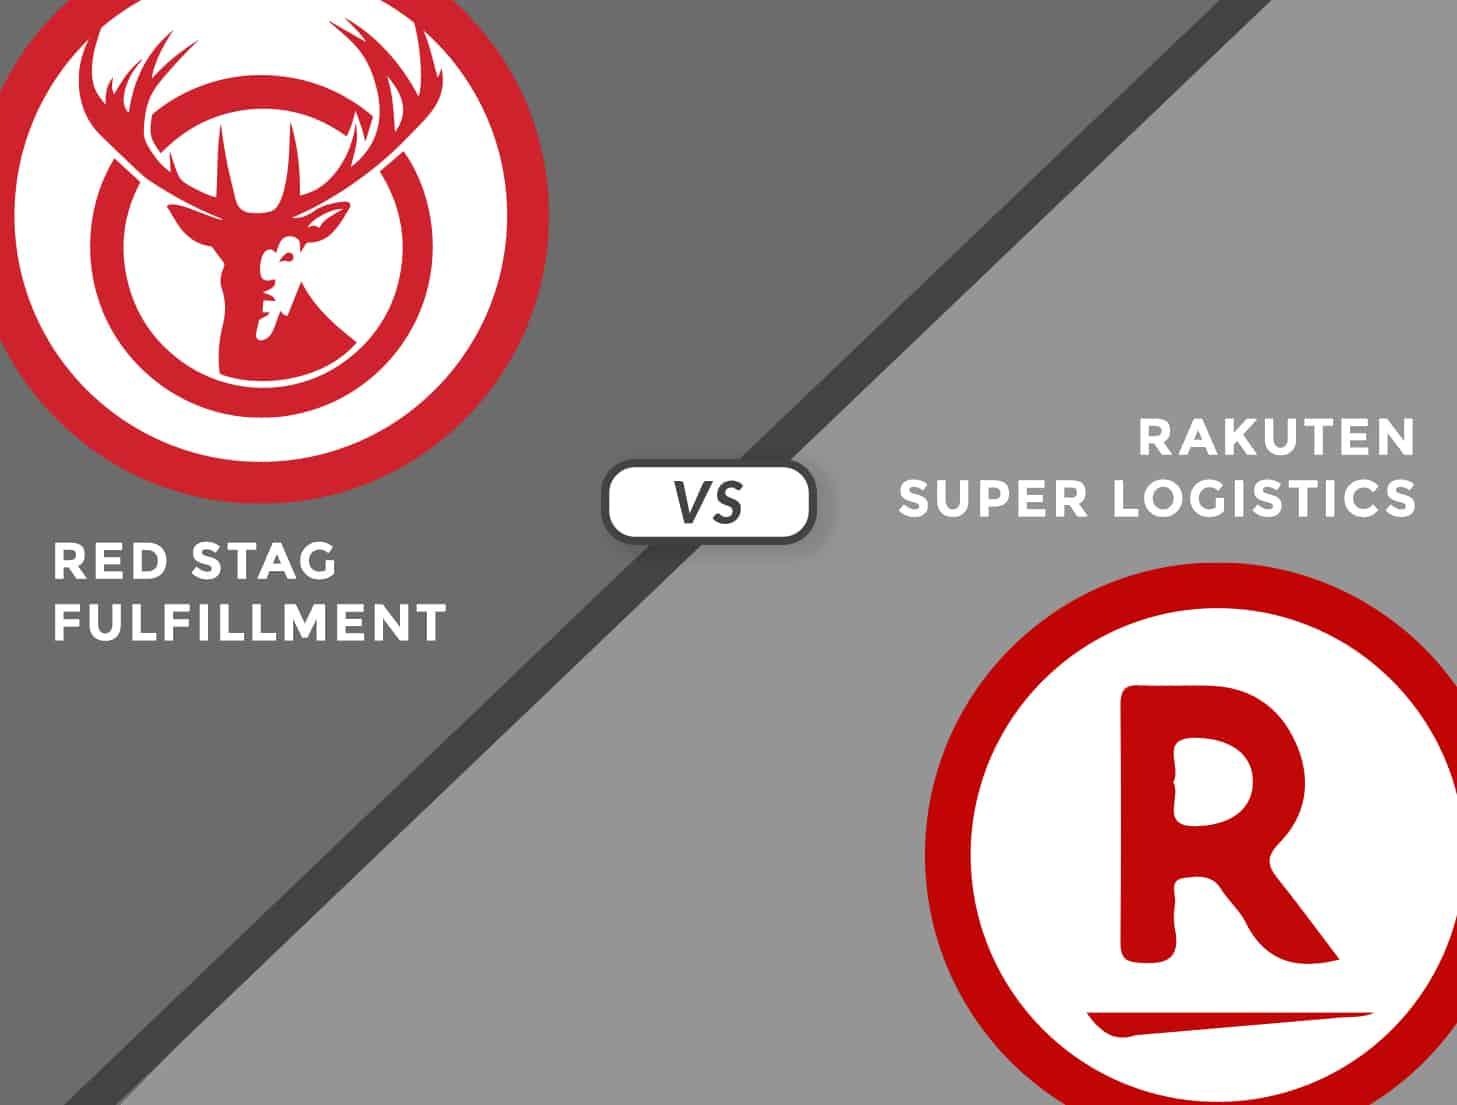 RSF vs. Rakuten Super Logistics